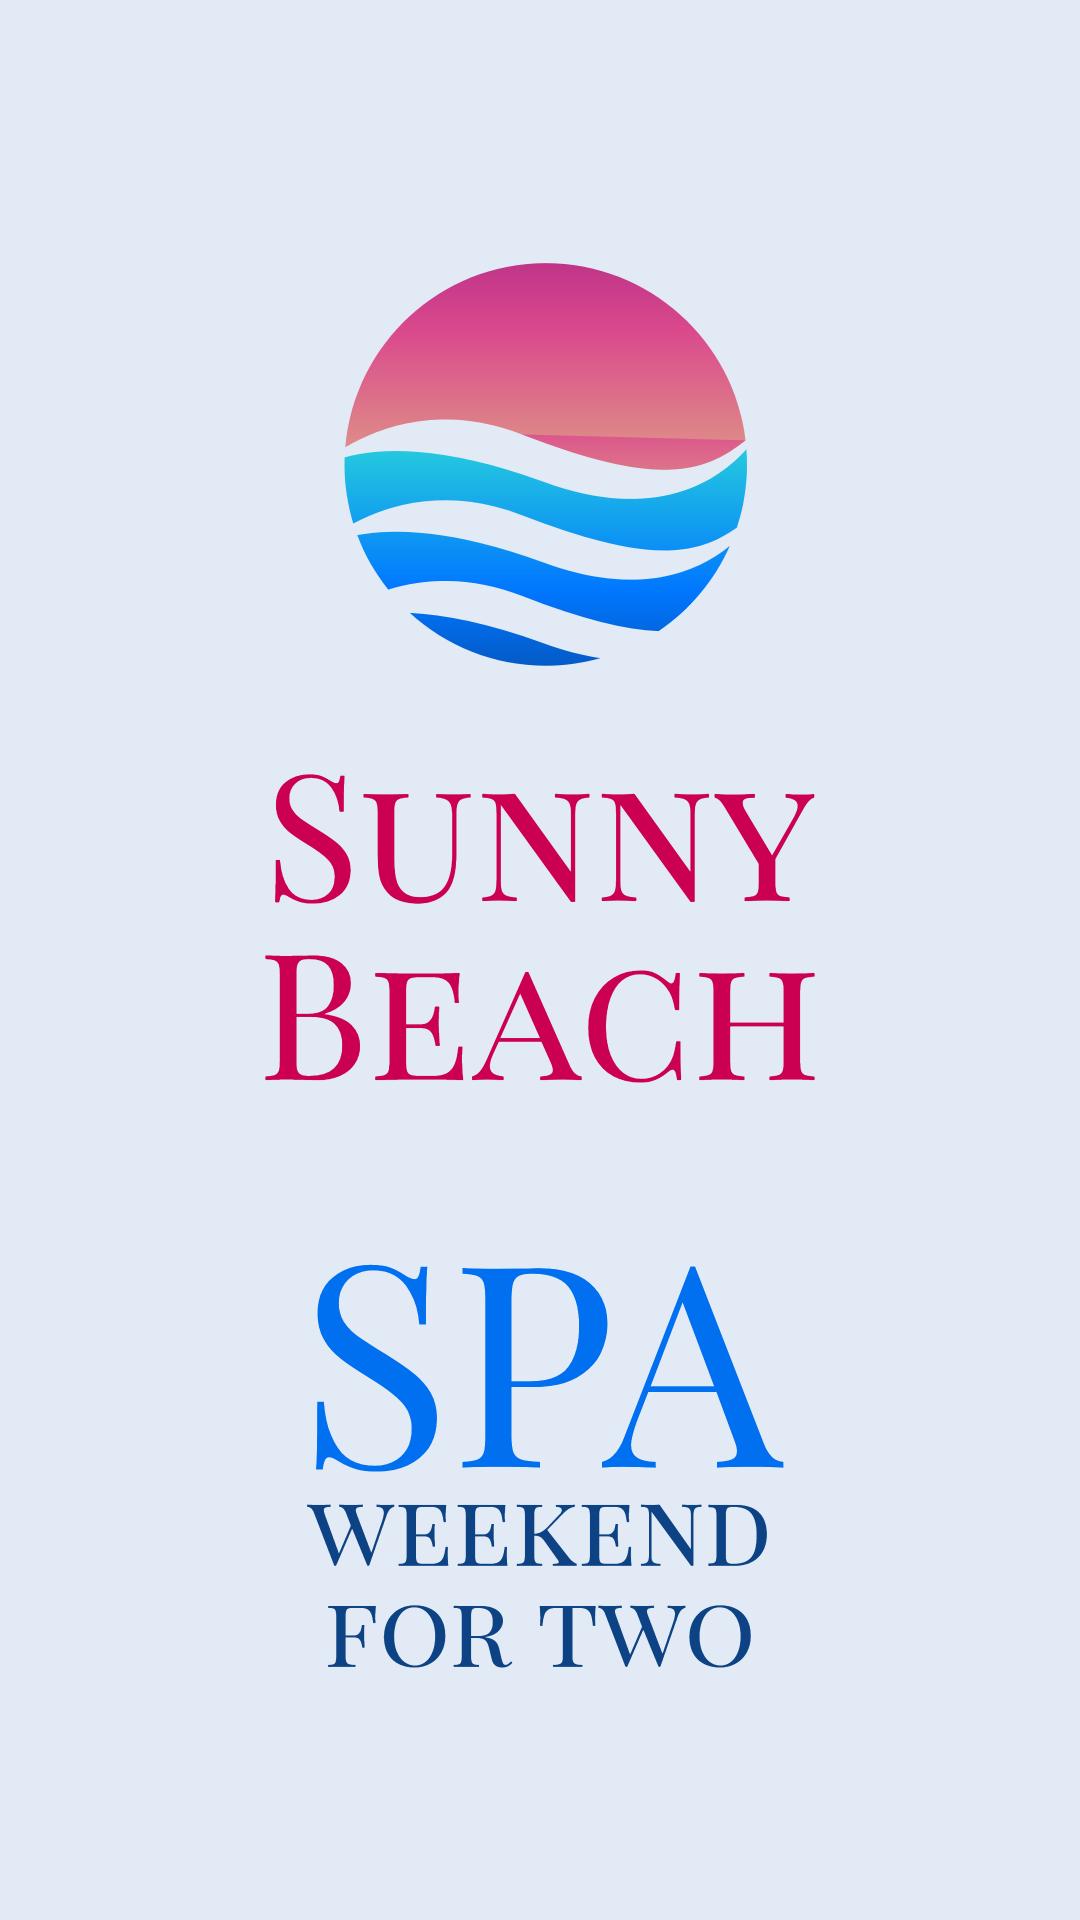 Sunny beach spa weekend